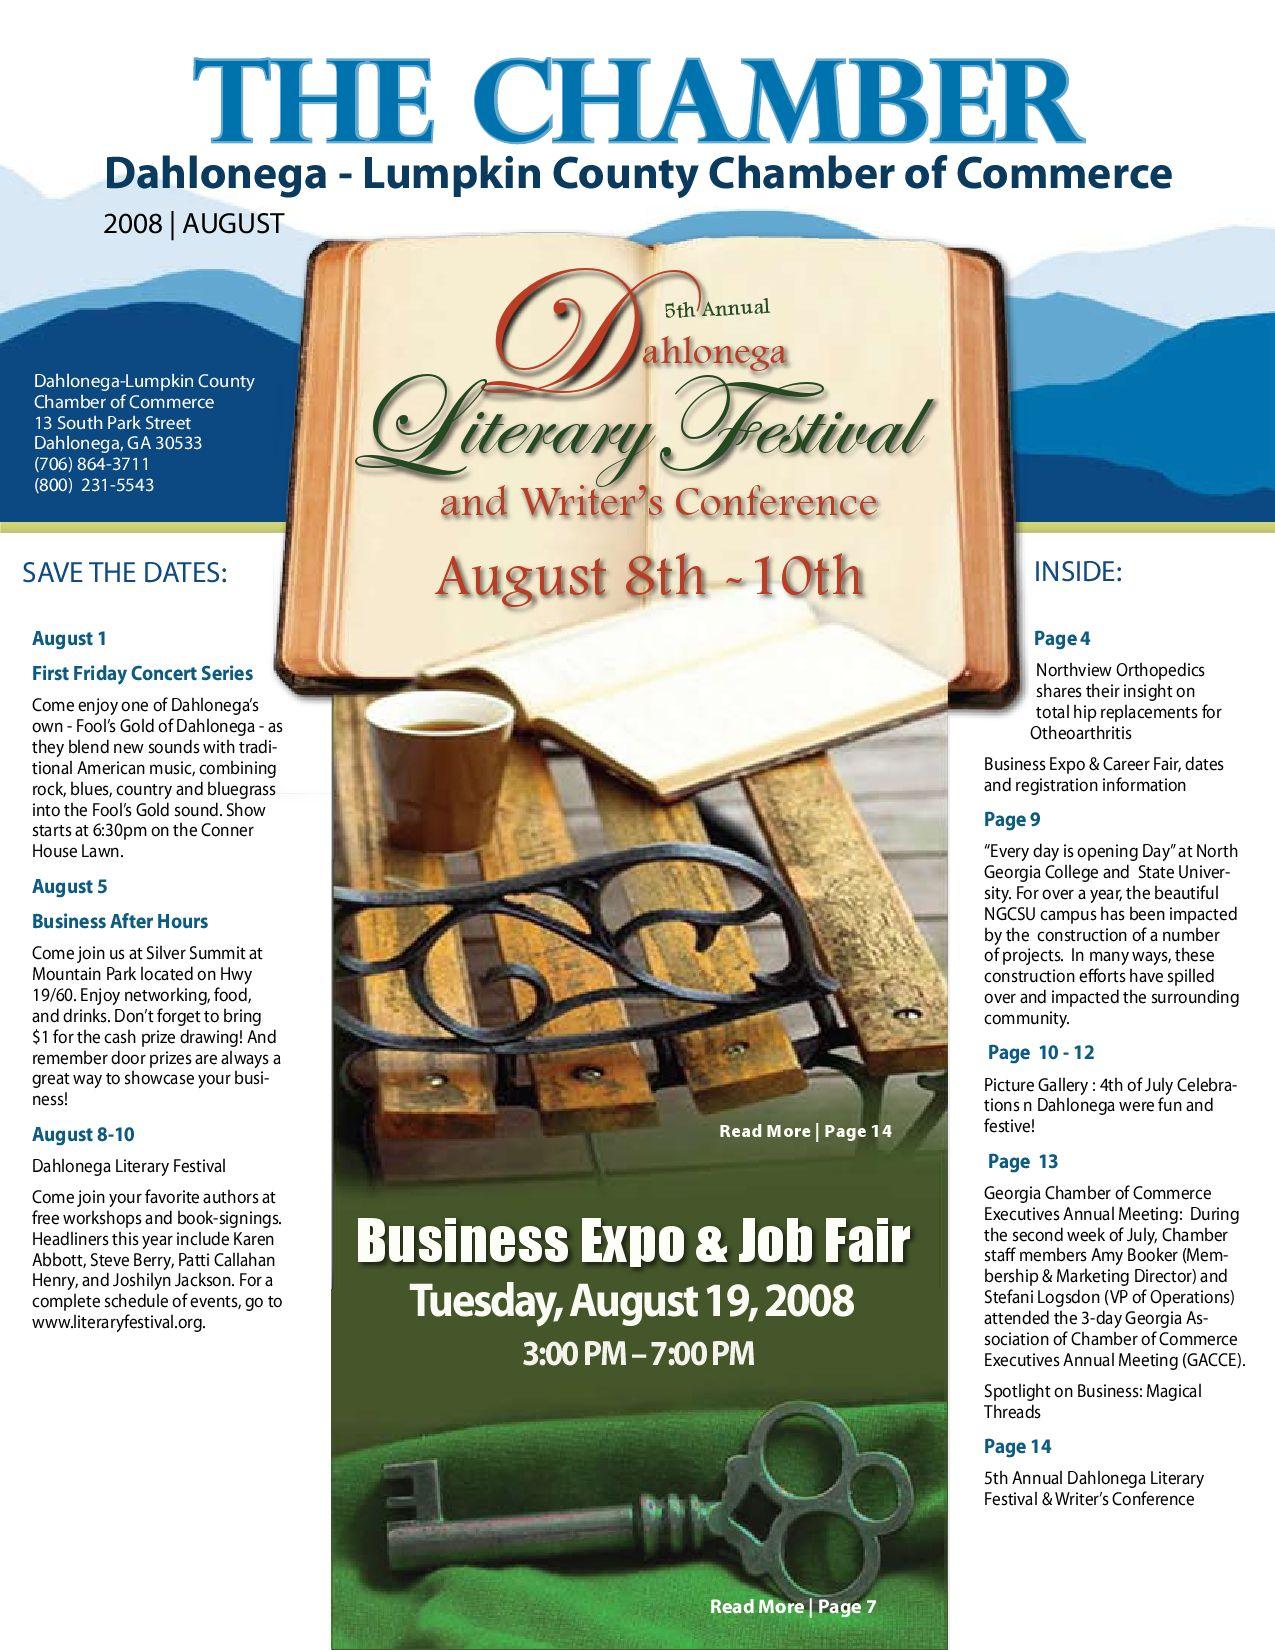 The chamber newsletter august 2008 by dahlonega lumpkin - Garden state orthopedics fair lawn ...